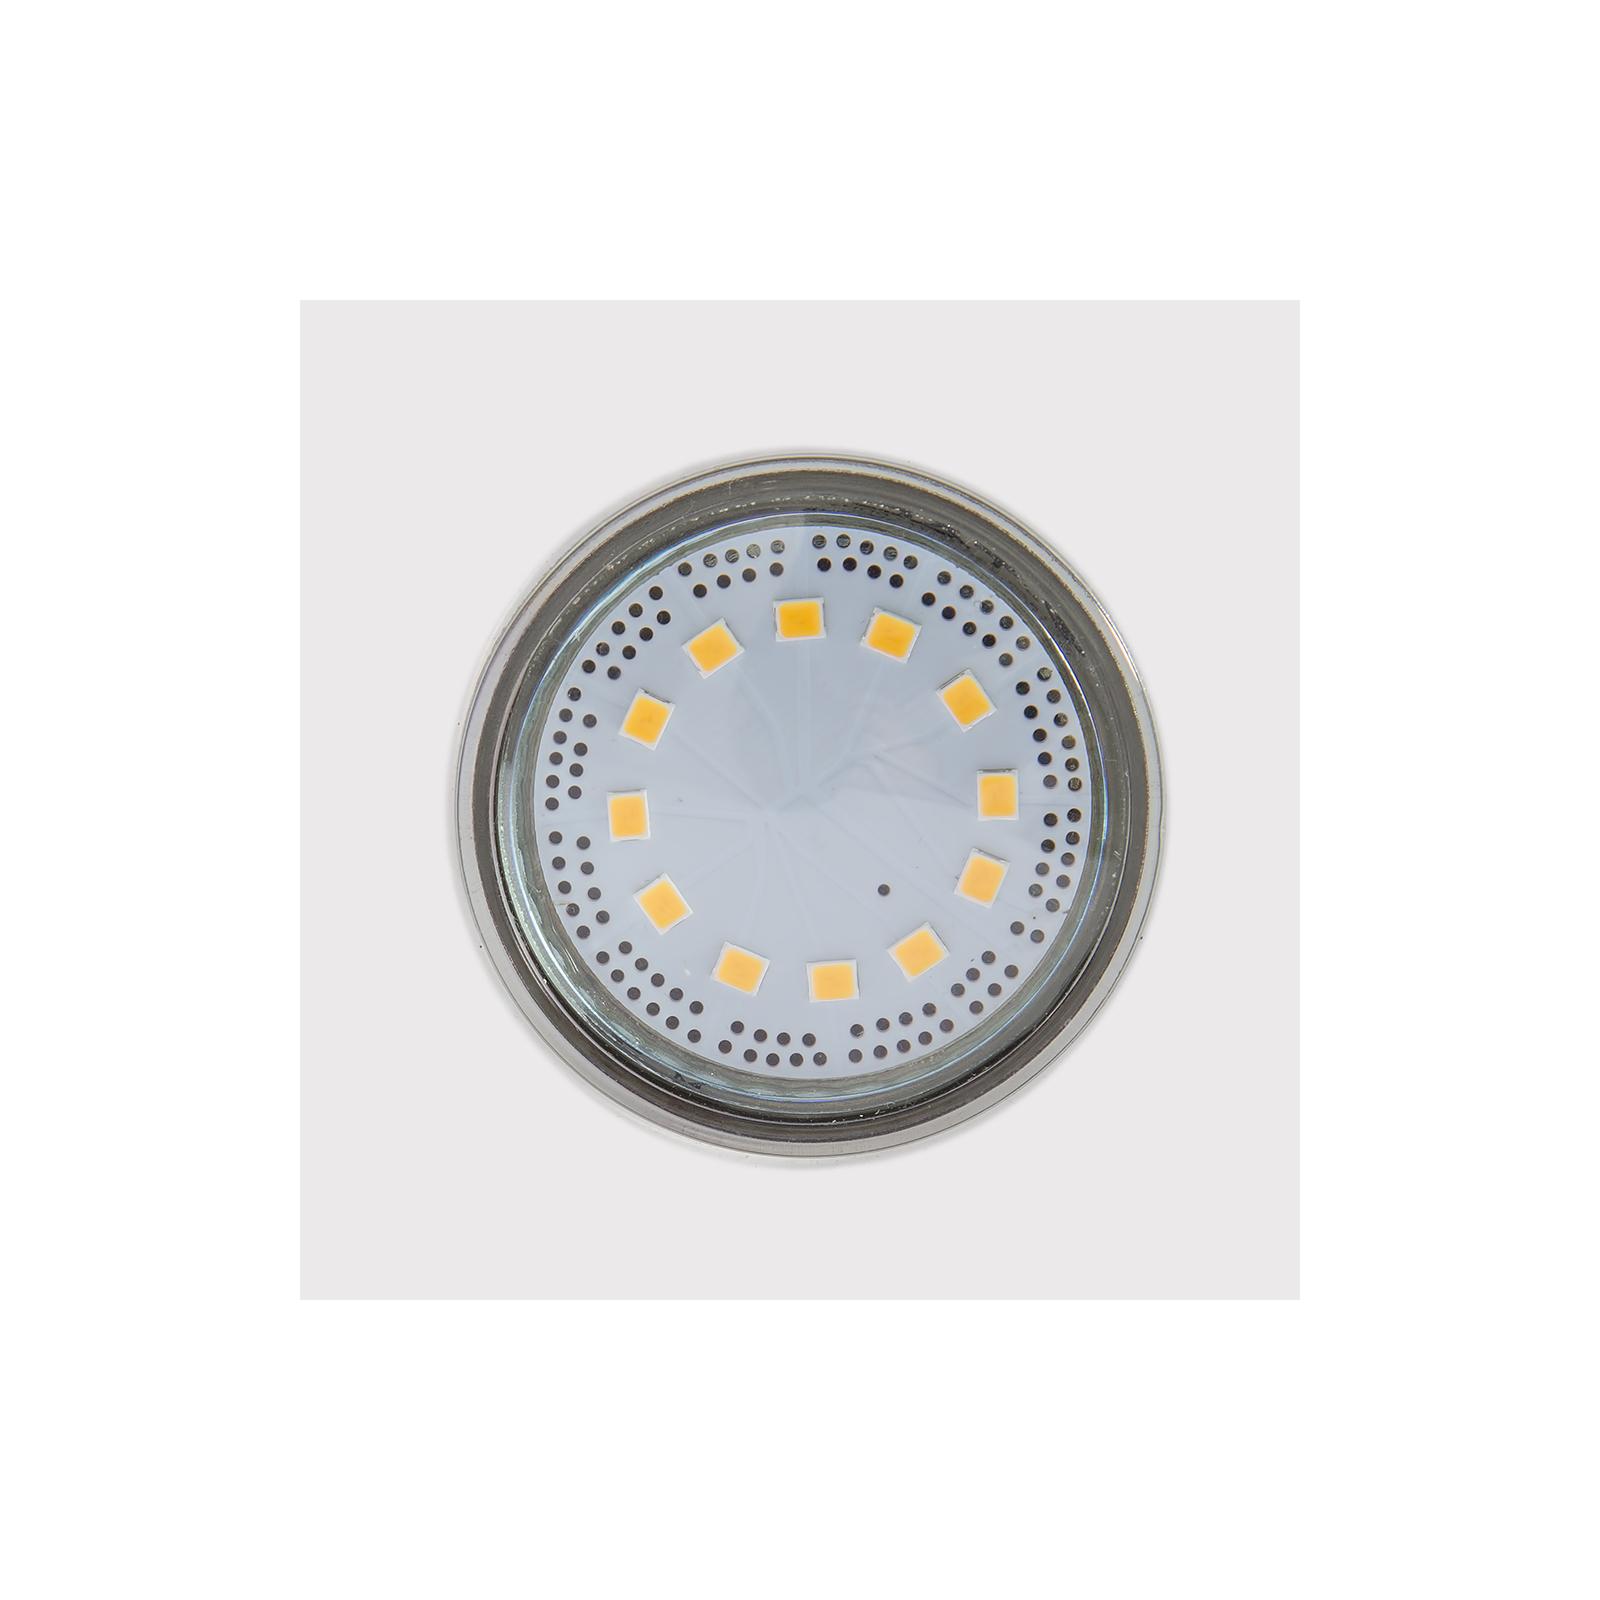 Вытяжка кухонная PERFELLI DNS 6114 BL LED изображение 6